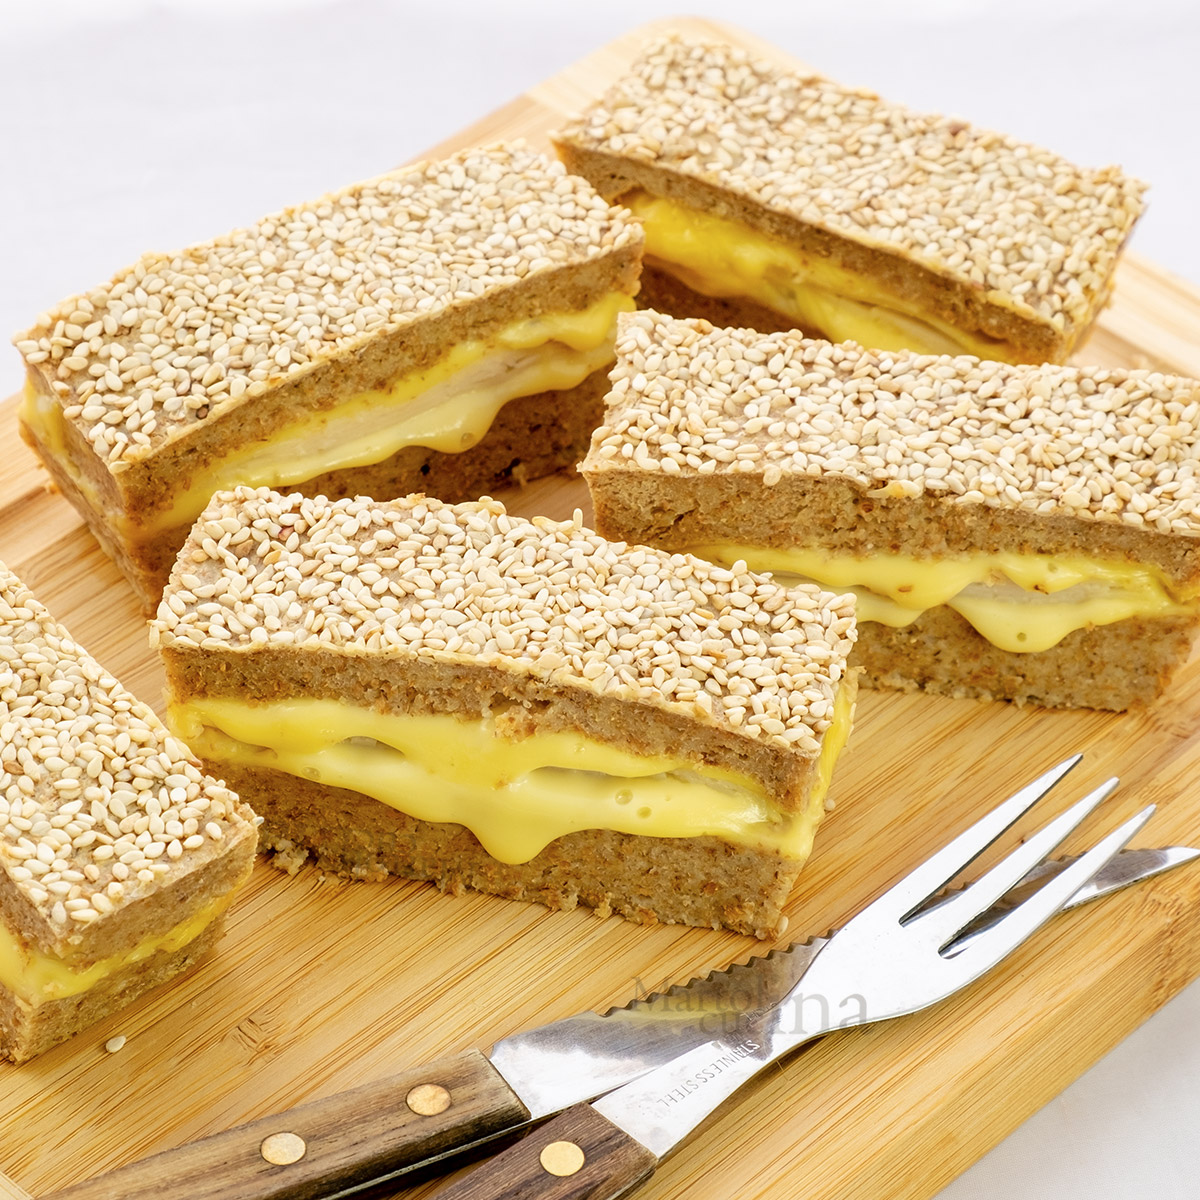 Torta salata di pane e ricotta ripiena